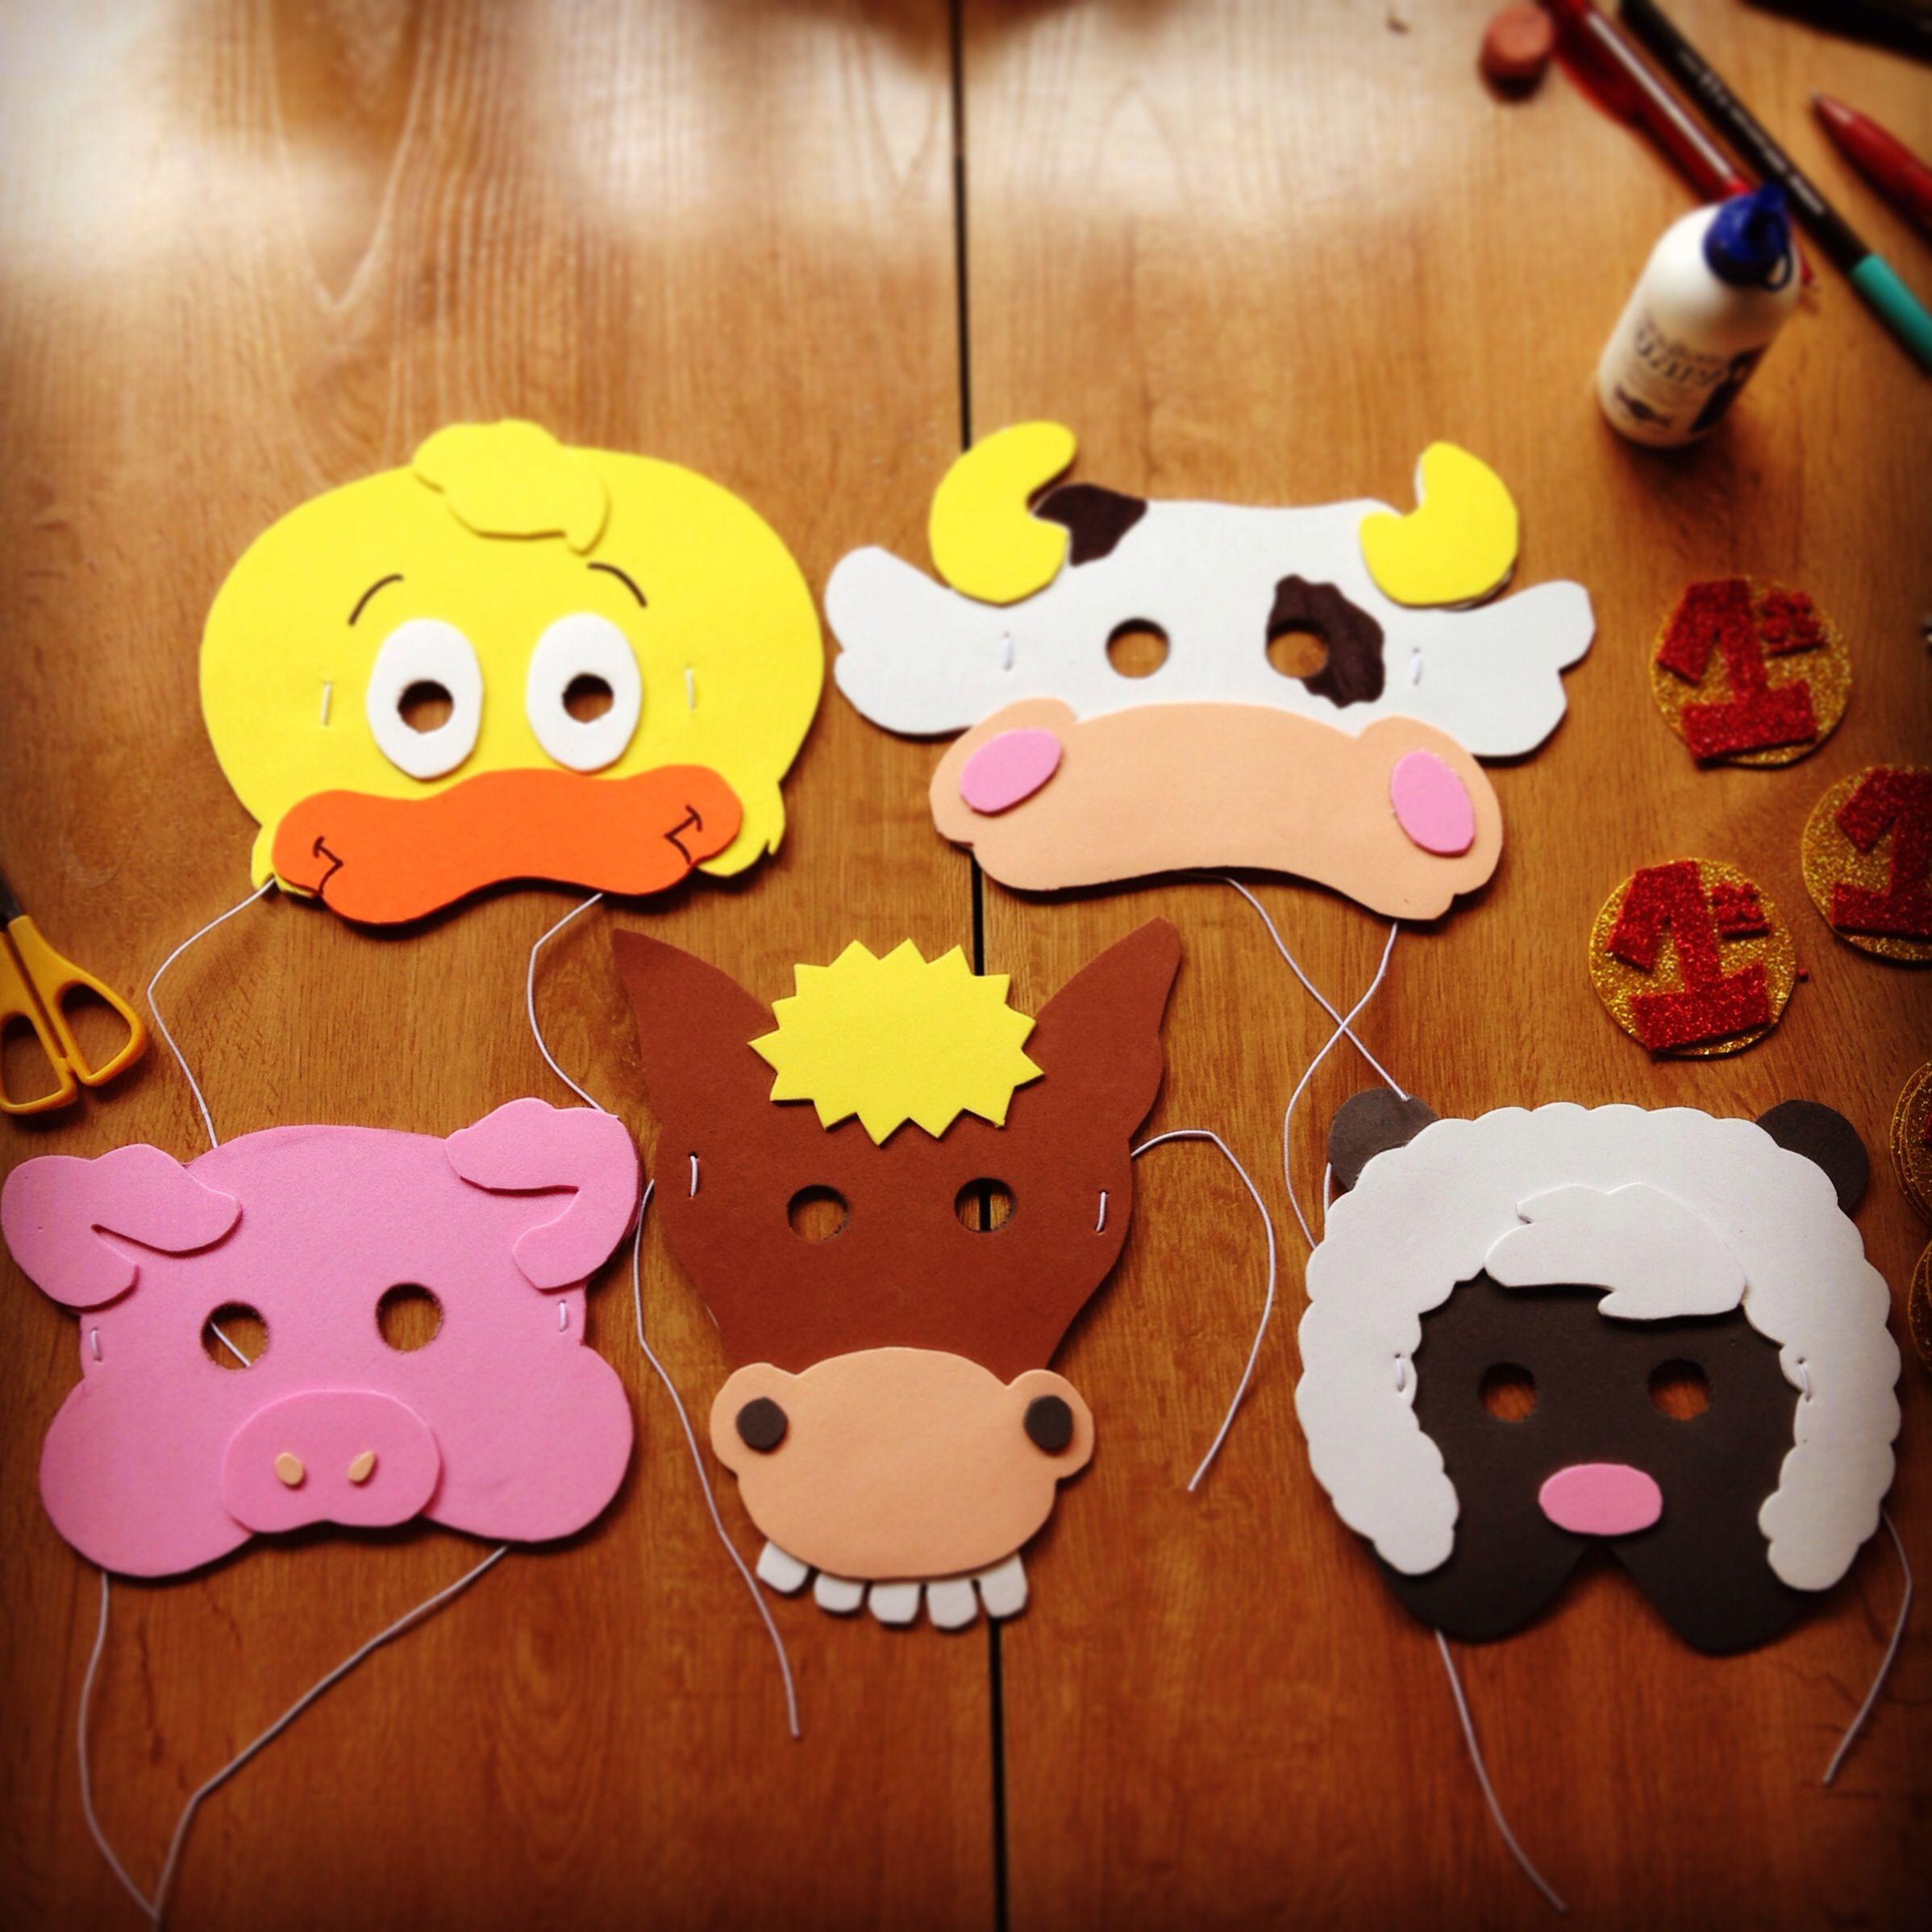 DIY: Old MacDonald's Masks. Farm Animals